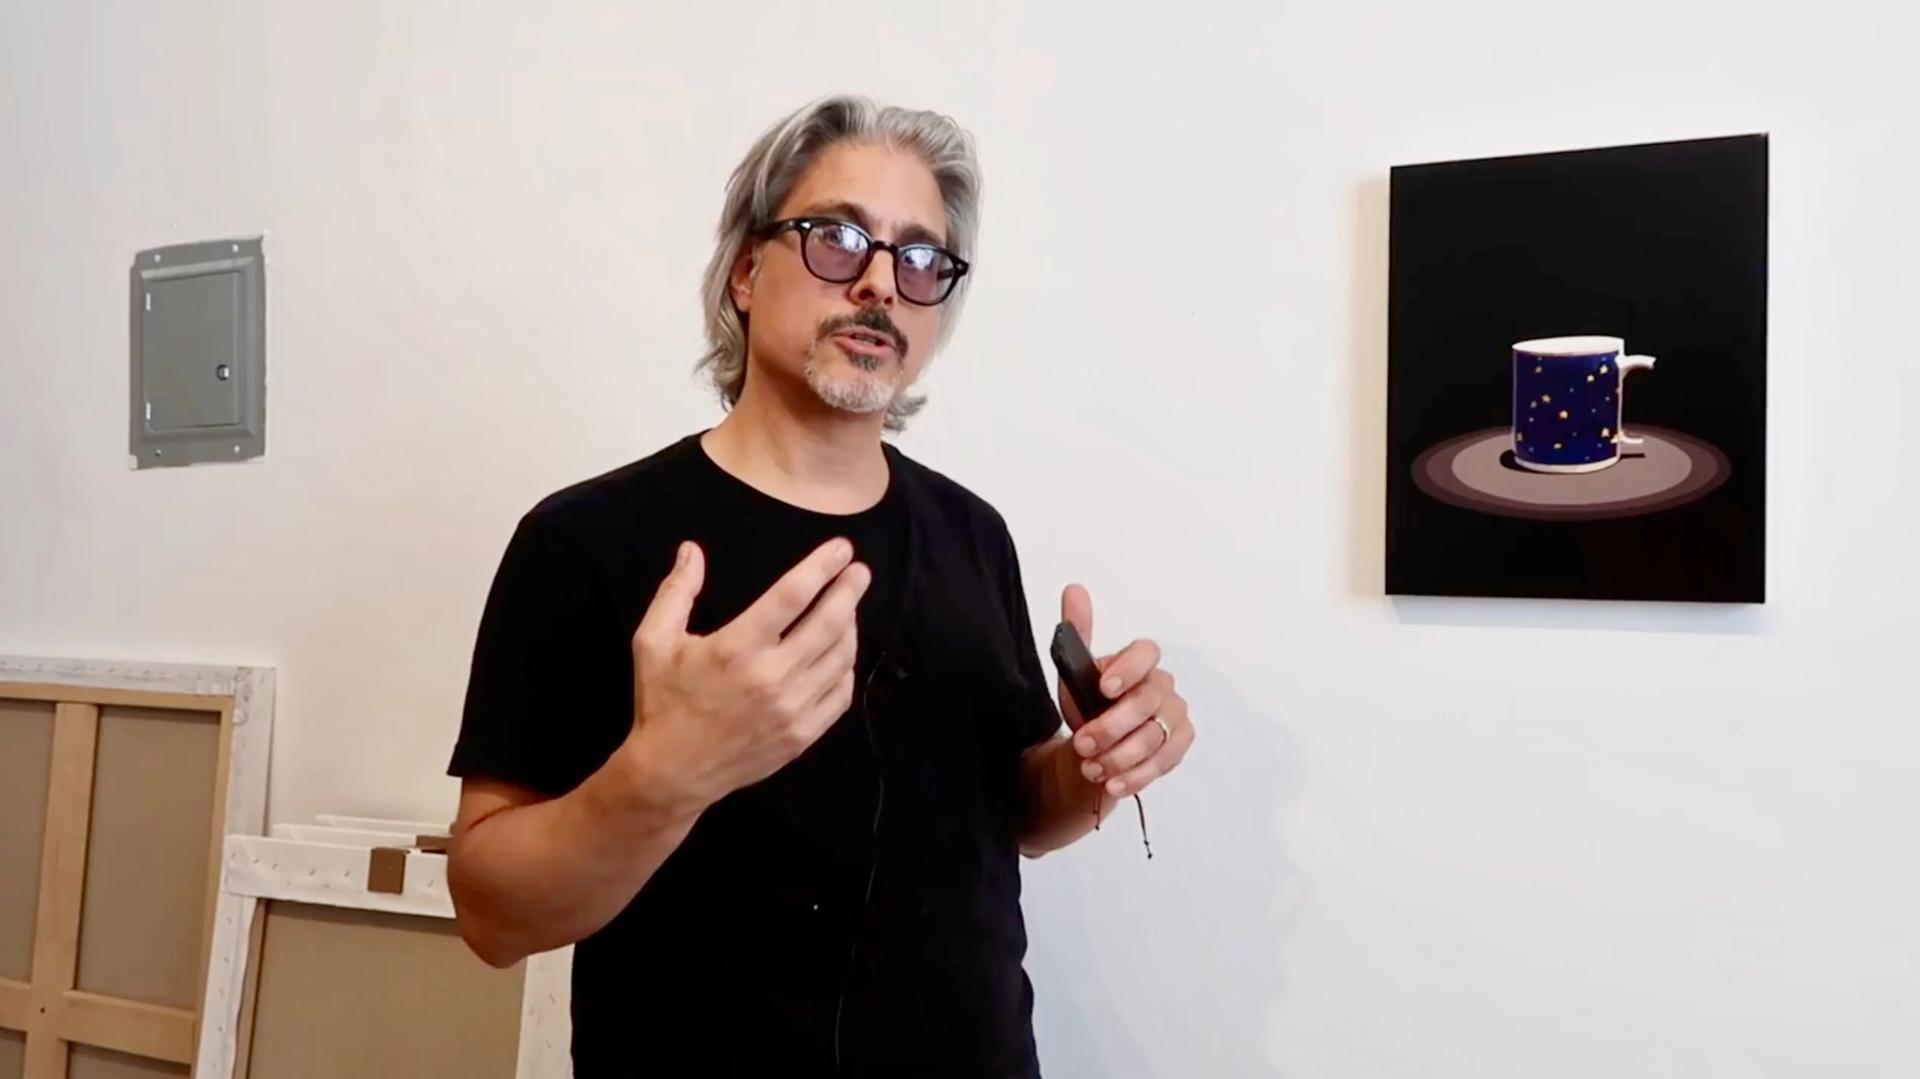 Richard Pasquarelli